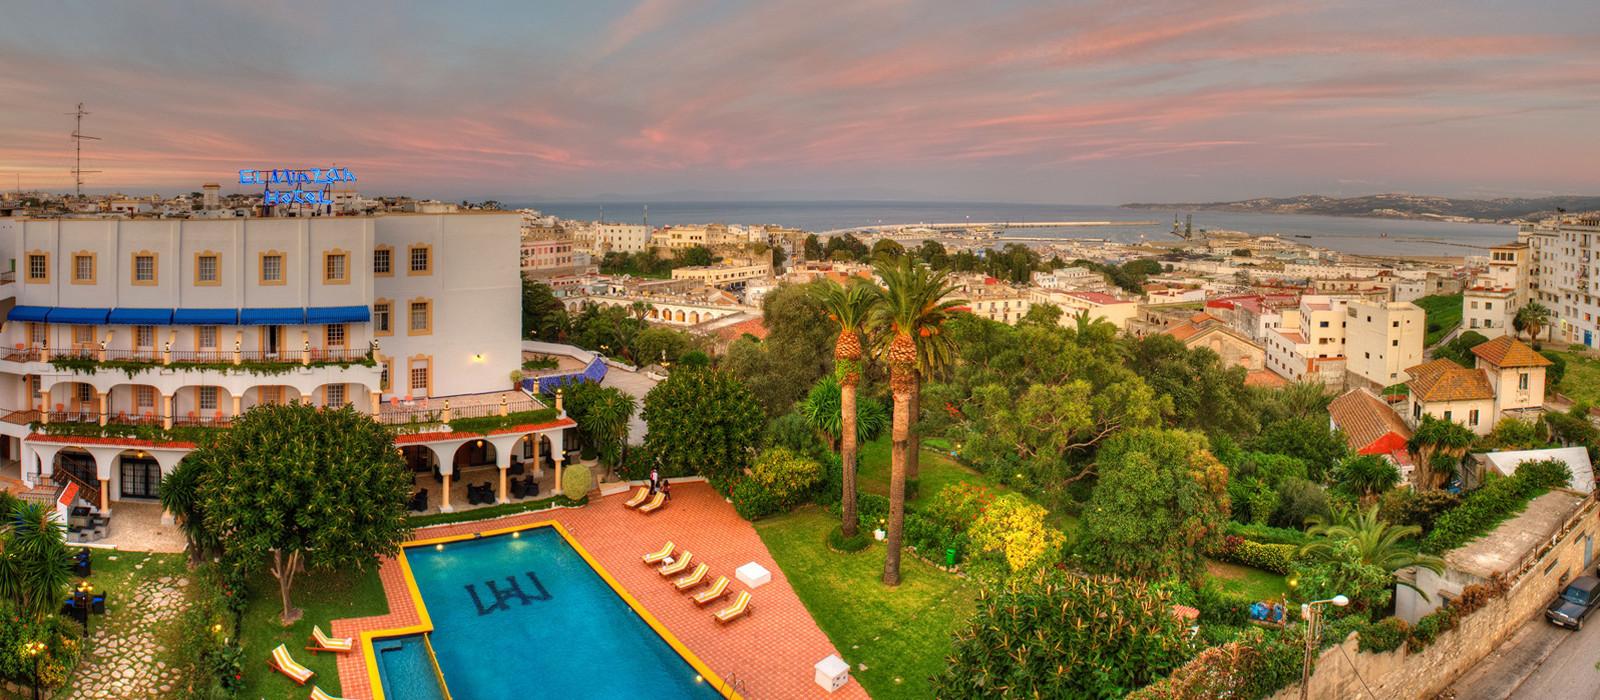 Hotel El Minzah  Tangier Marokko